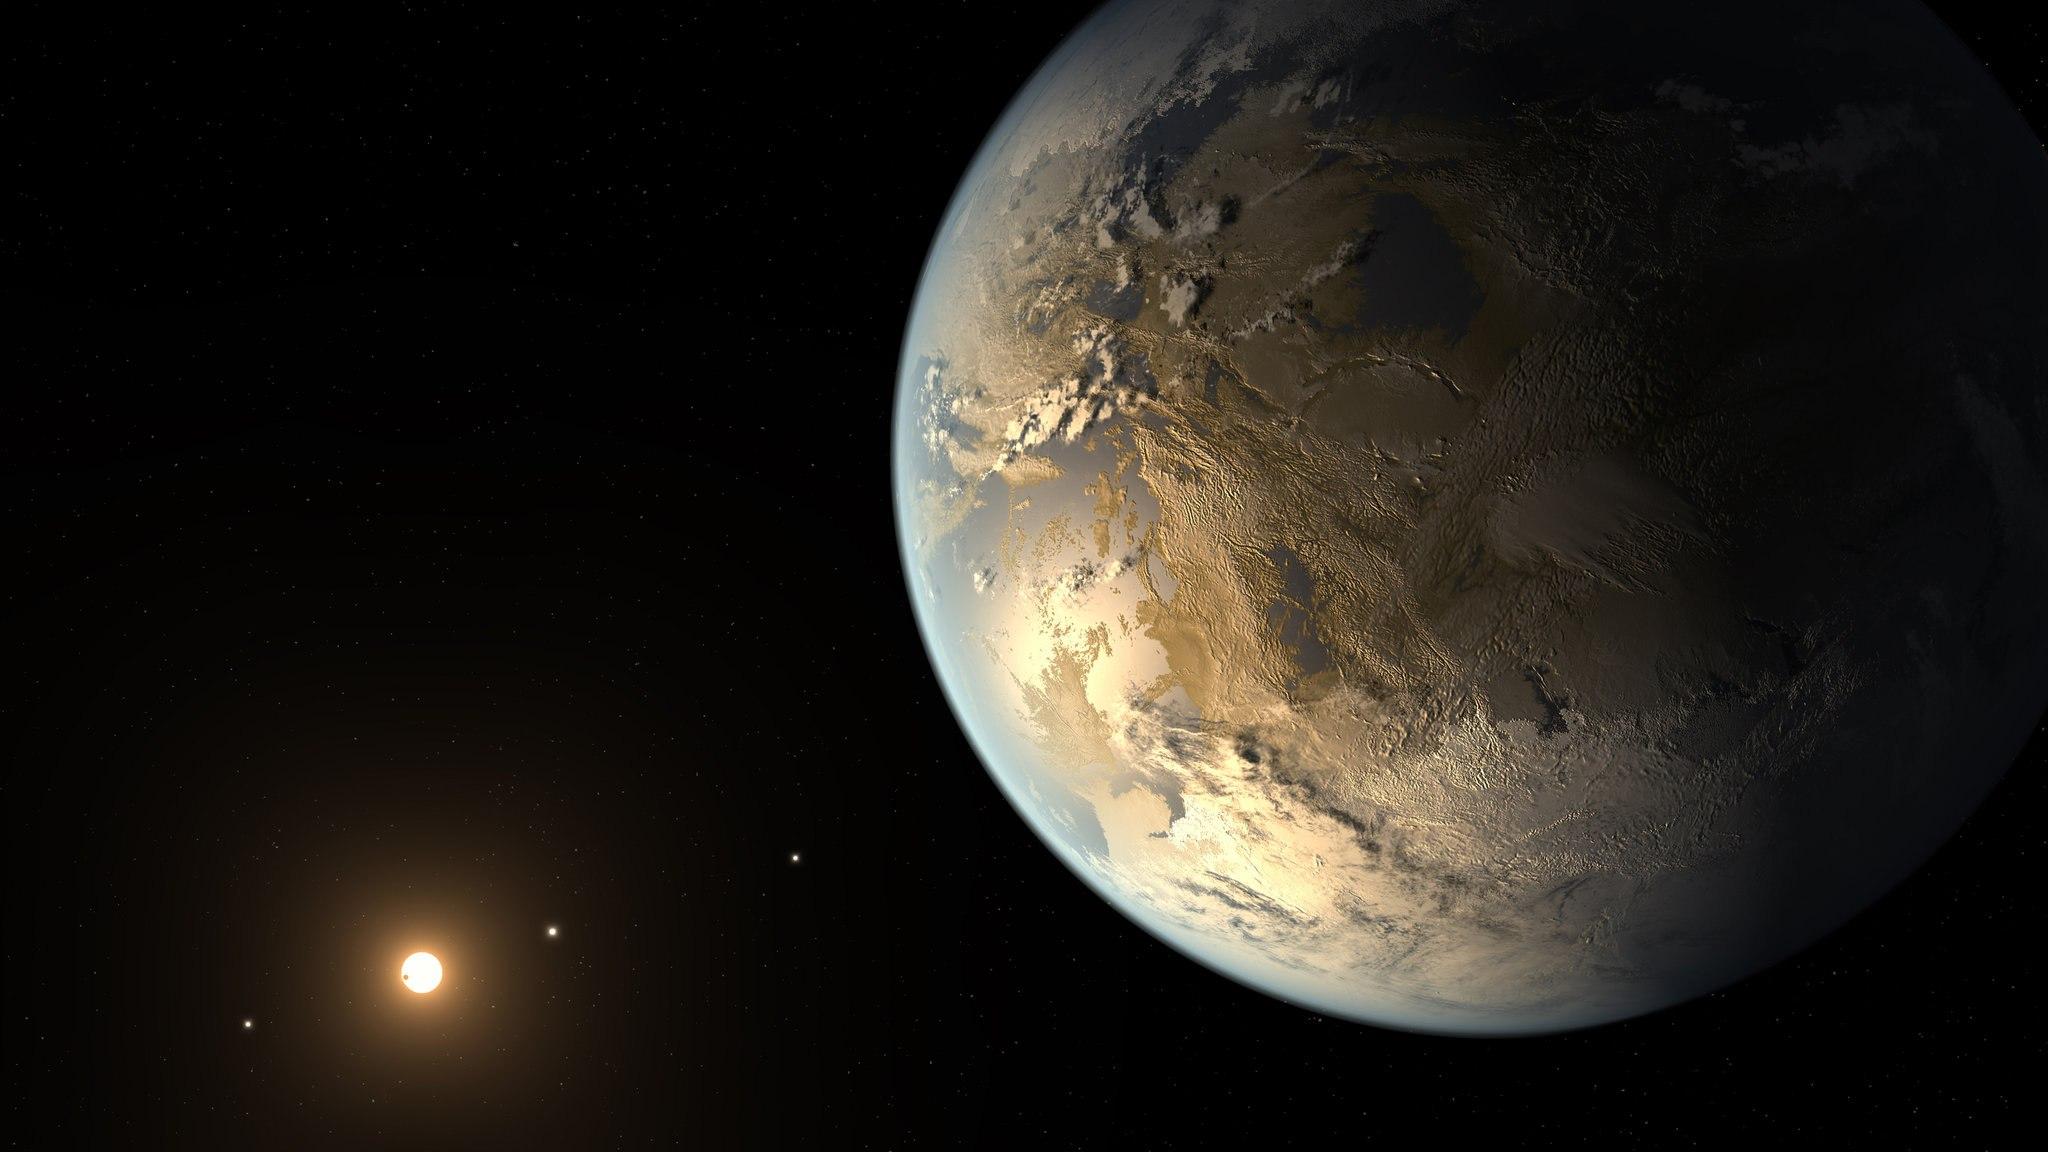 Найдена планета — копия Земли  Астрономы обнаружили «близнеца» Земли.